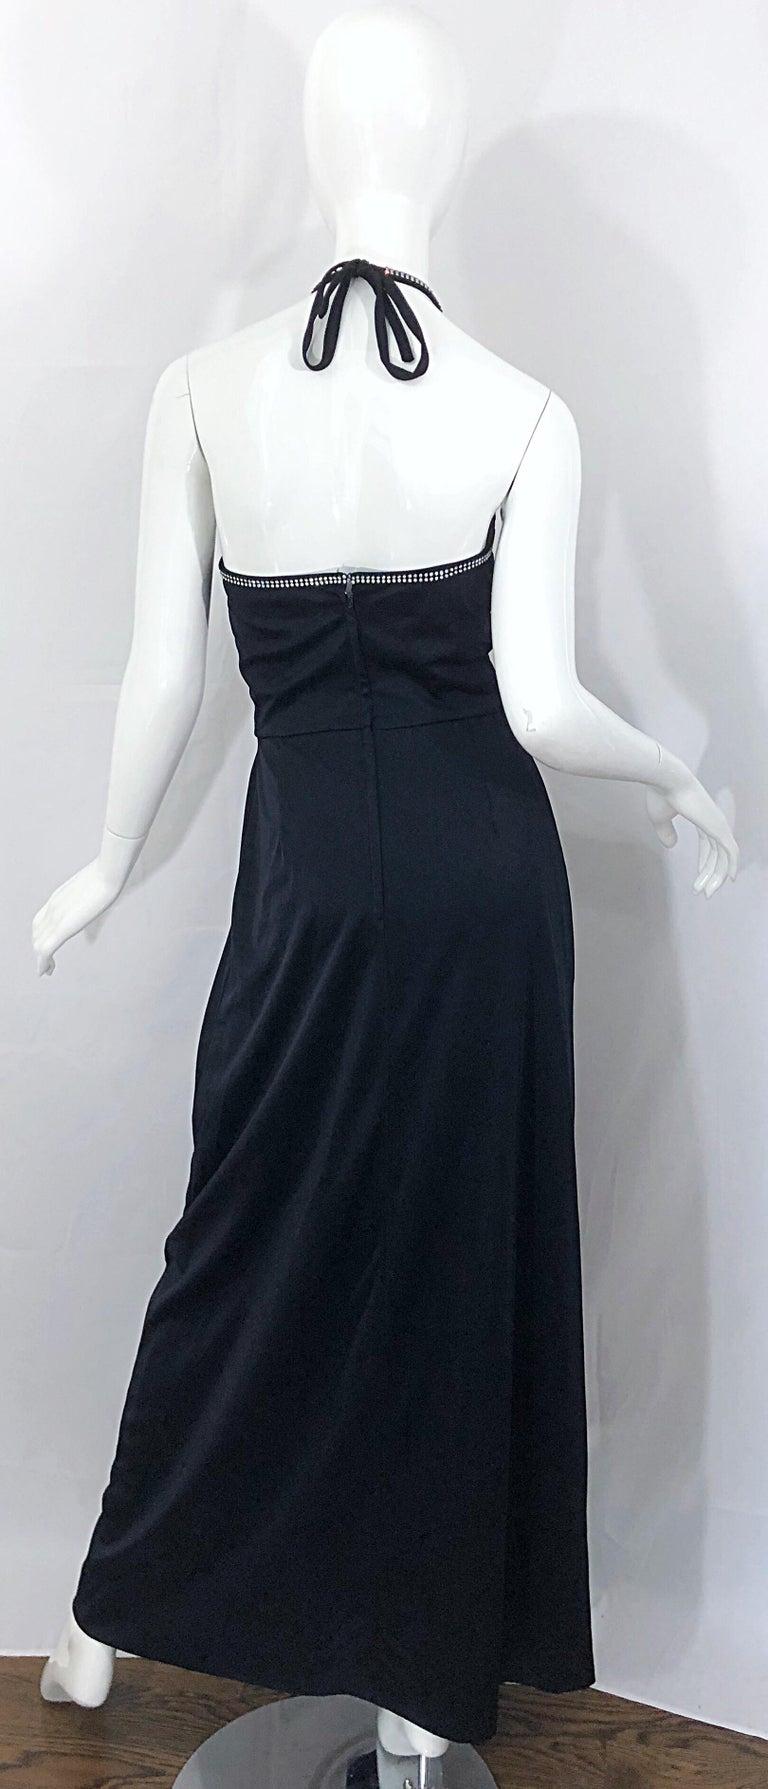 1970s Lilli Diamond Black Jersey Rhinestone Vintage 70s Wrap Maxi Dress Gown For Sale 2